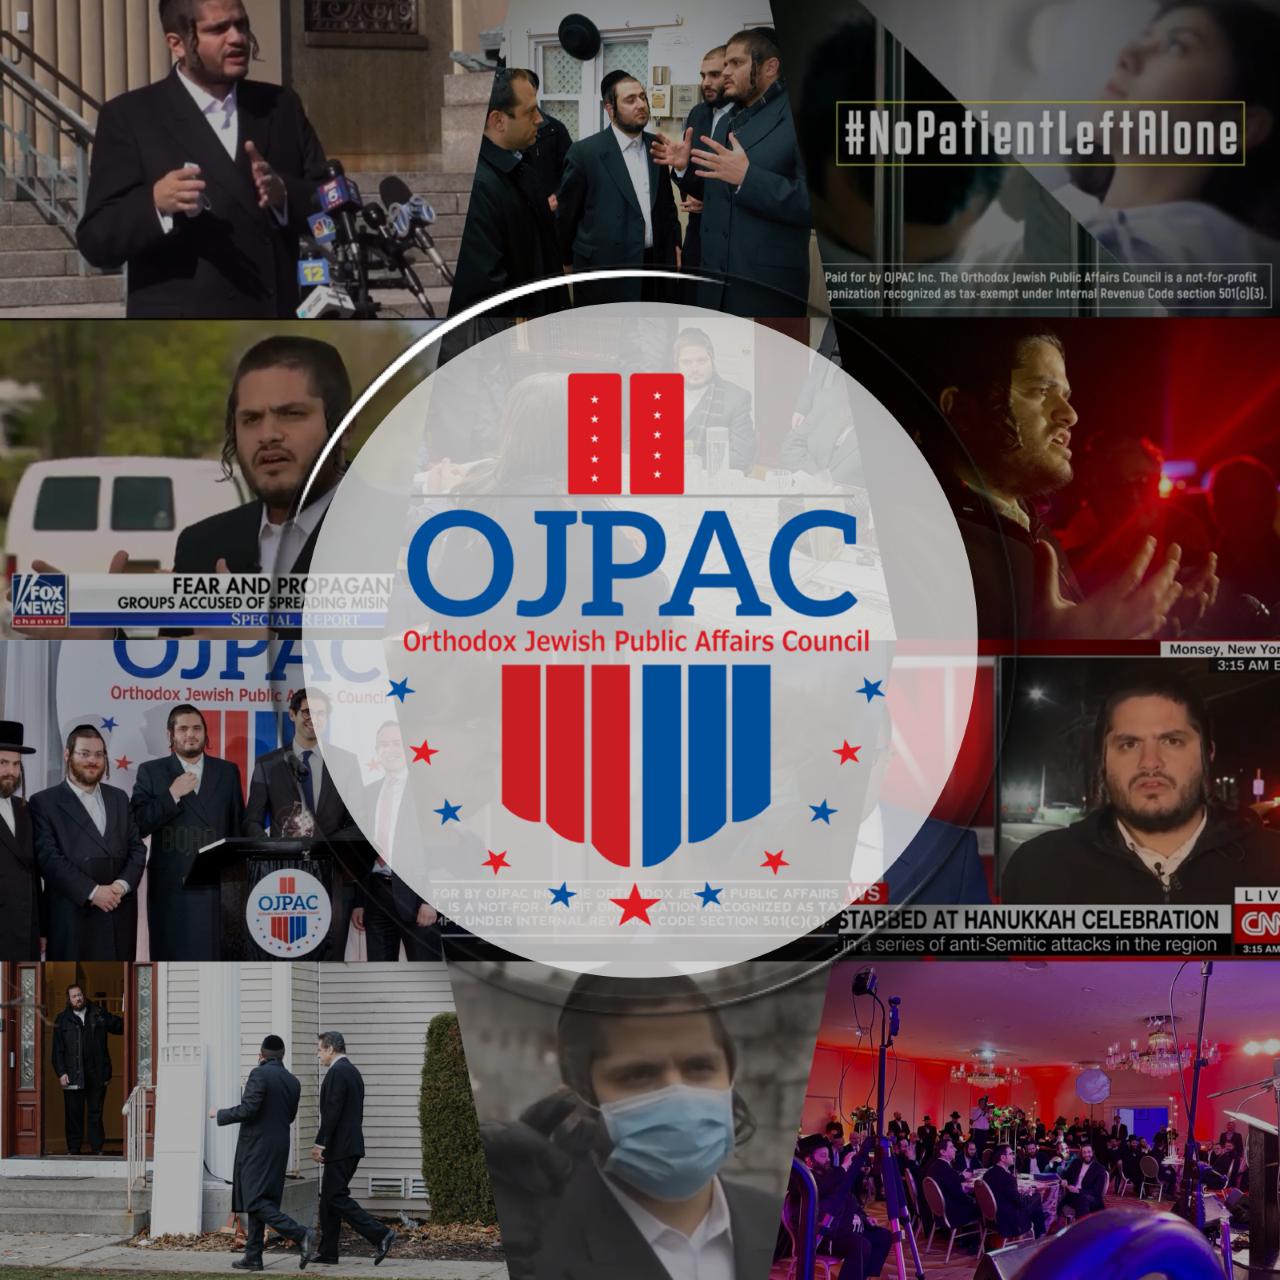 VIDEO: OJPAC Presser Regarding Cuomo's Rhetoric on COVID-19 and Orthodox Jews